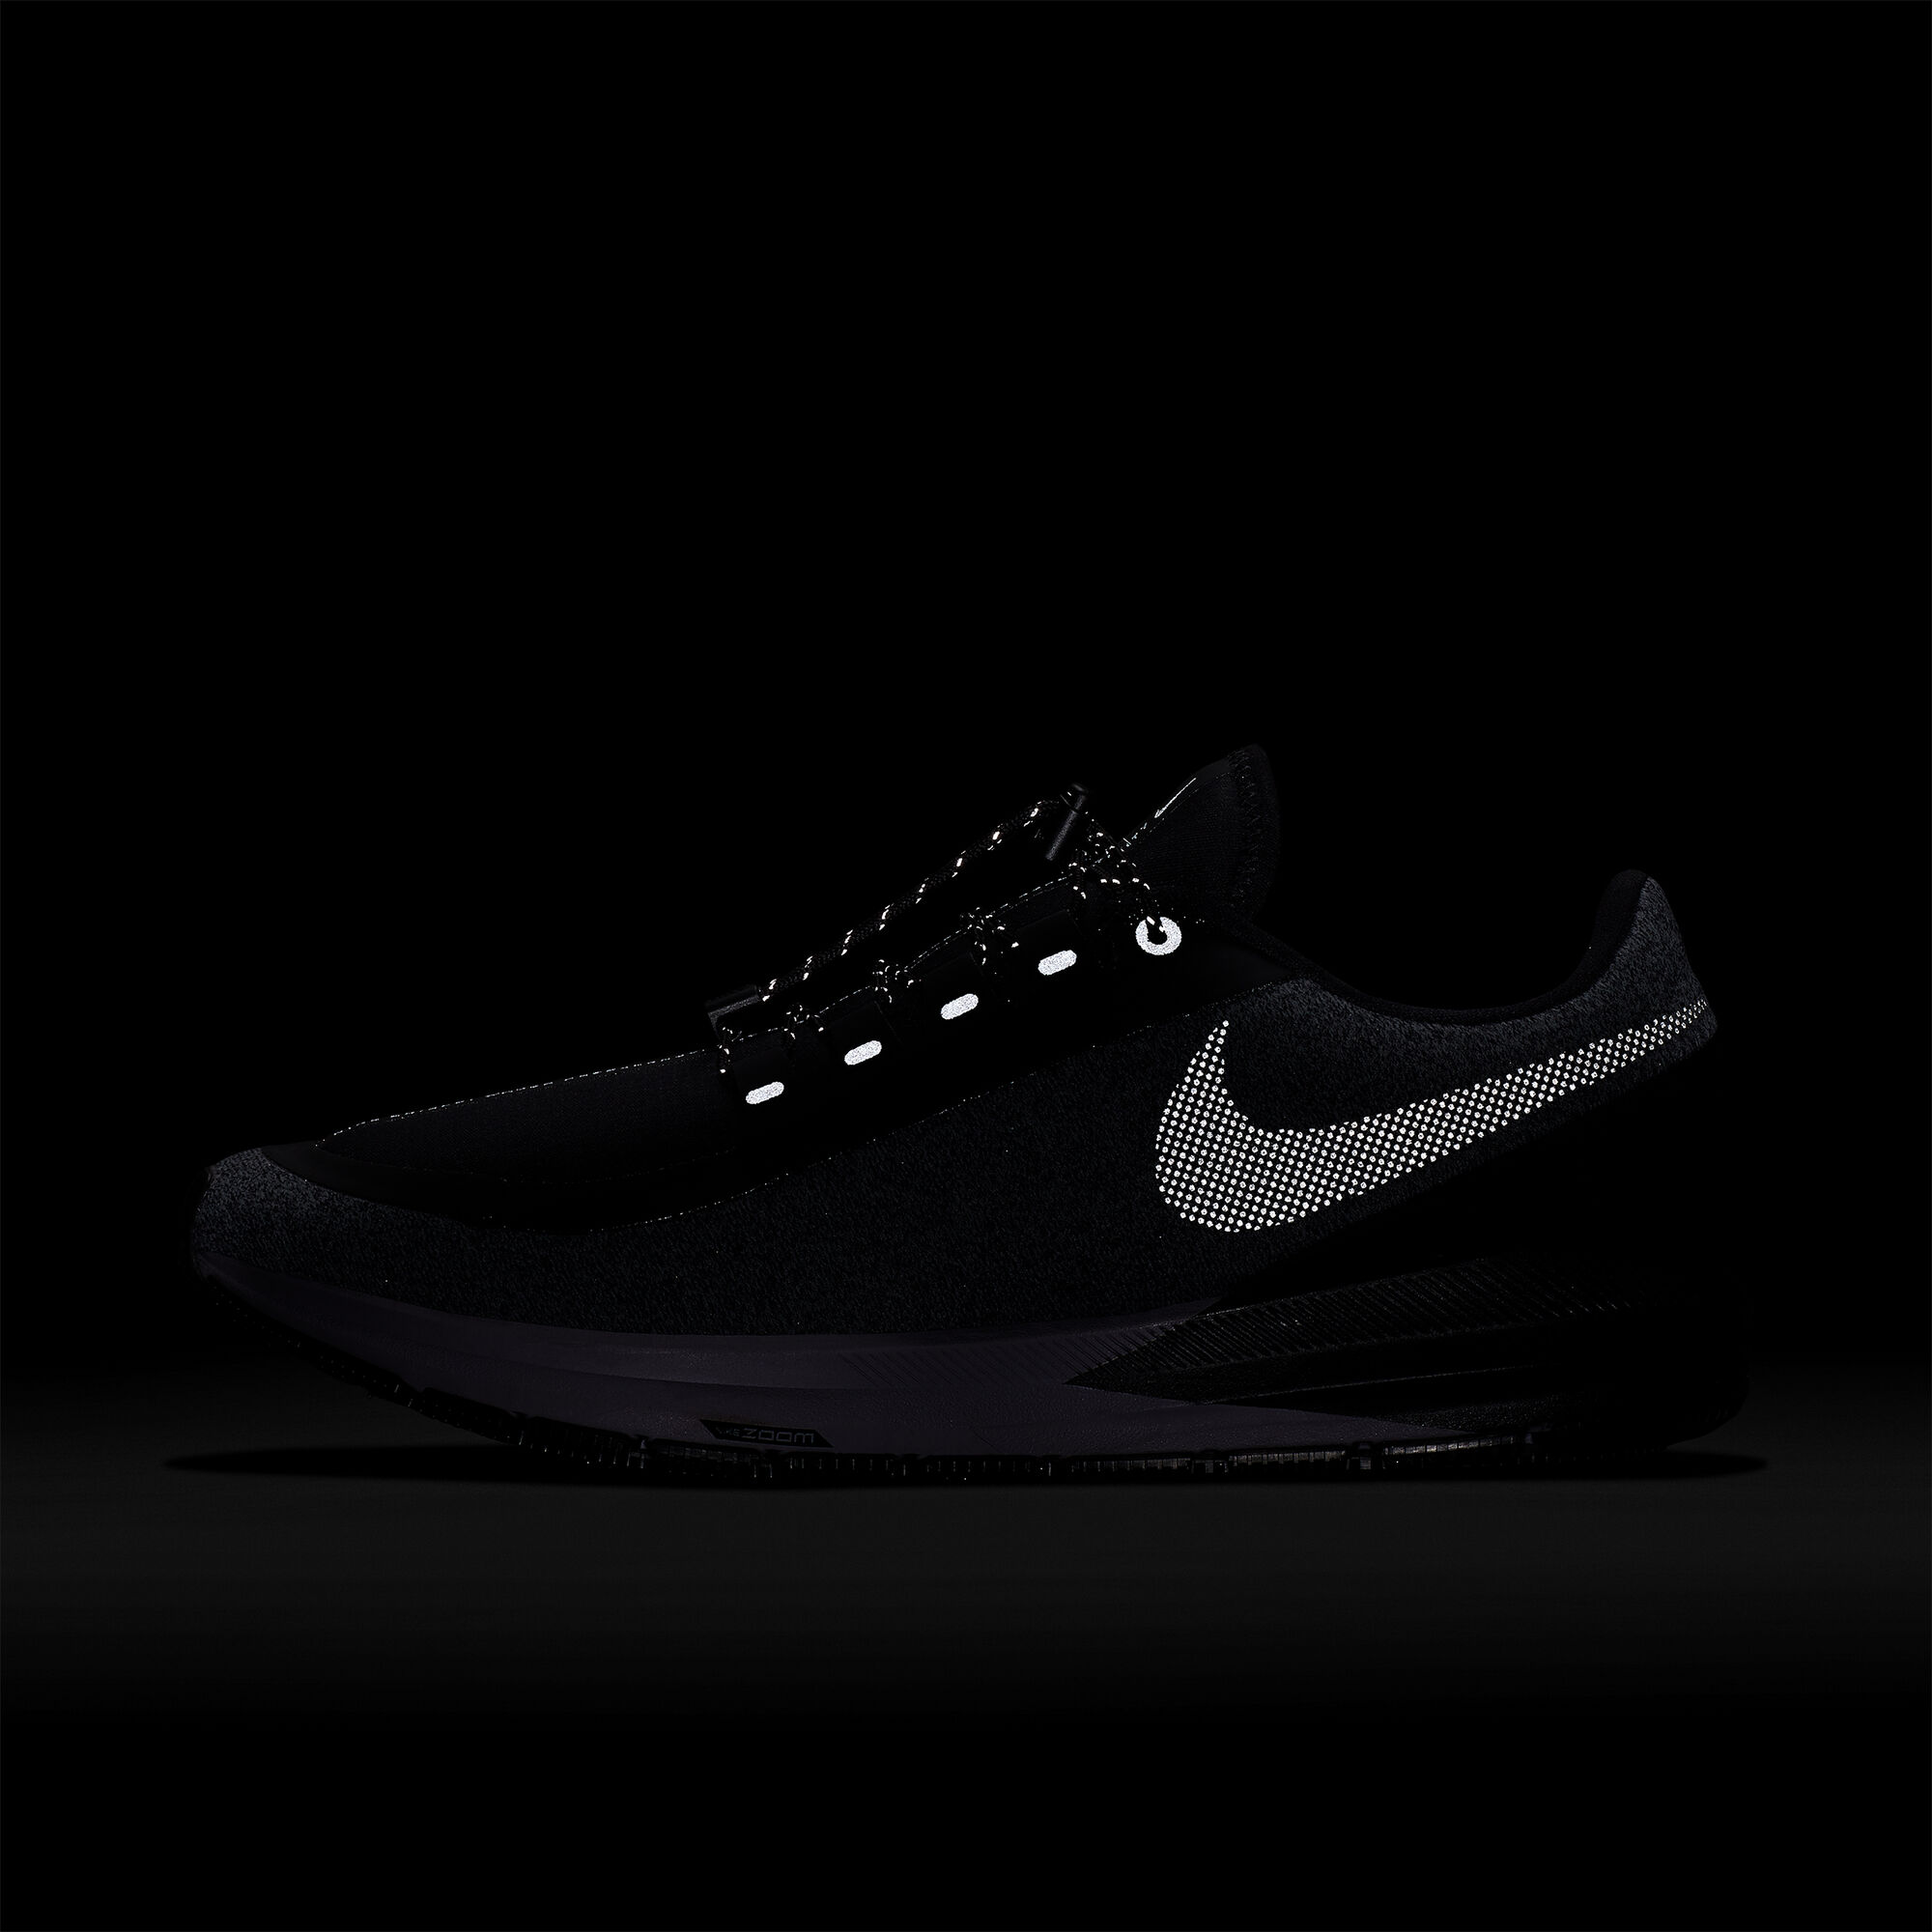 ad24b27c91f2 Nike  Nike  Nike  Nike  Nike  Nike  Nike  Nike  Nike  Nike  Nike  Nike. Air  Zoom Structure 22 Shield ...